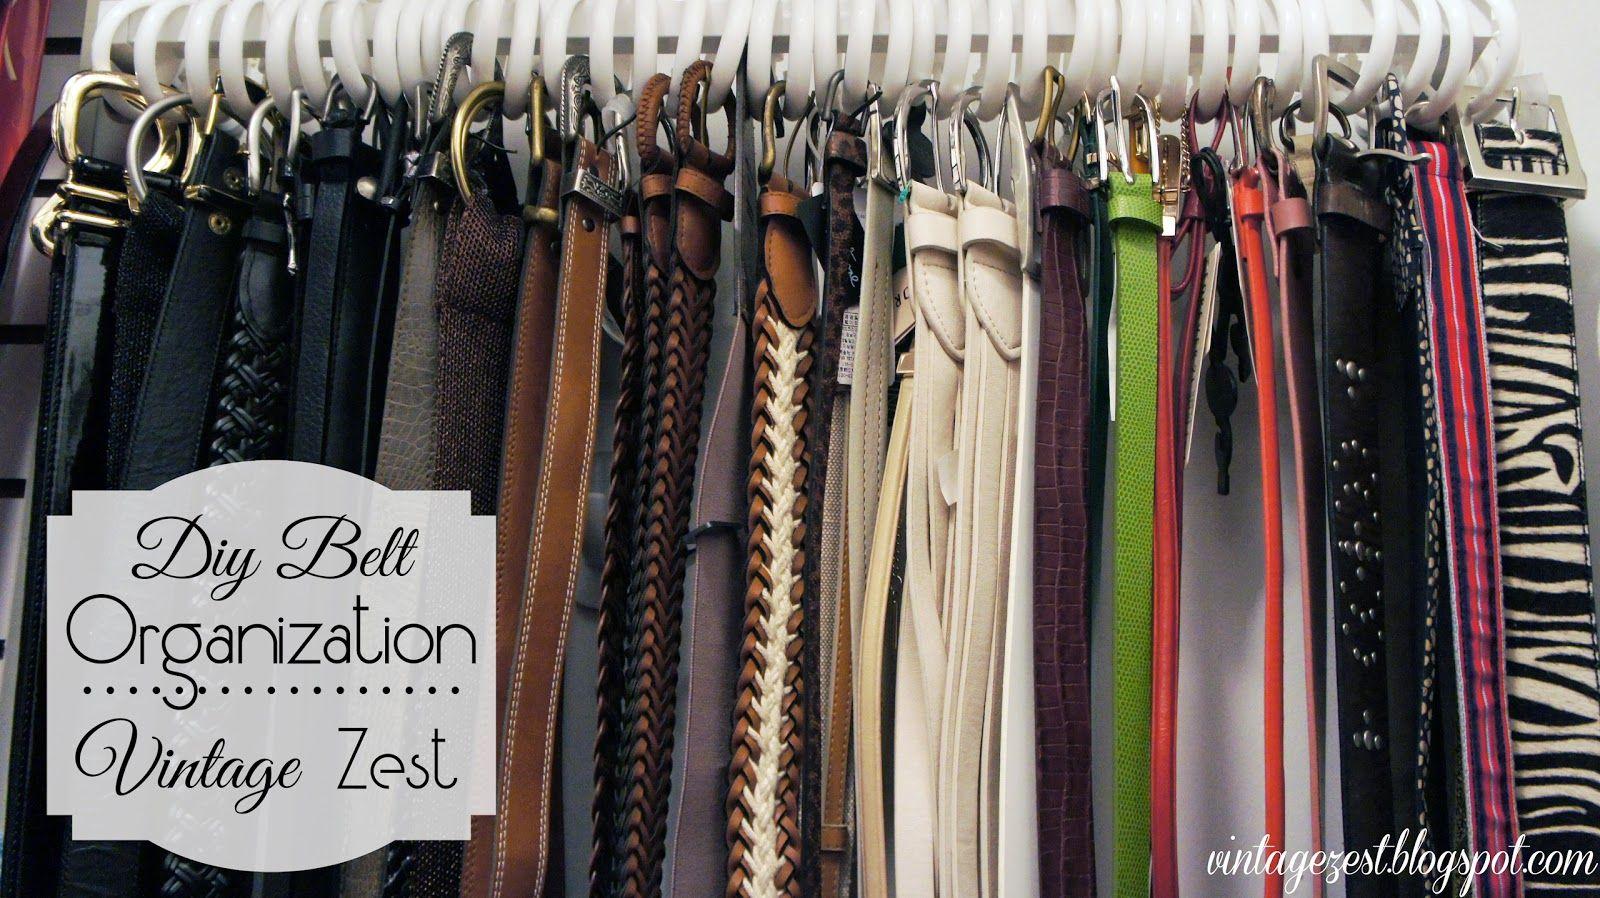 Organizing Belts On Pinterest Belt Organization Belt Storage And Organize Ties